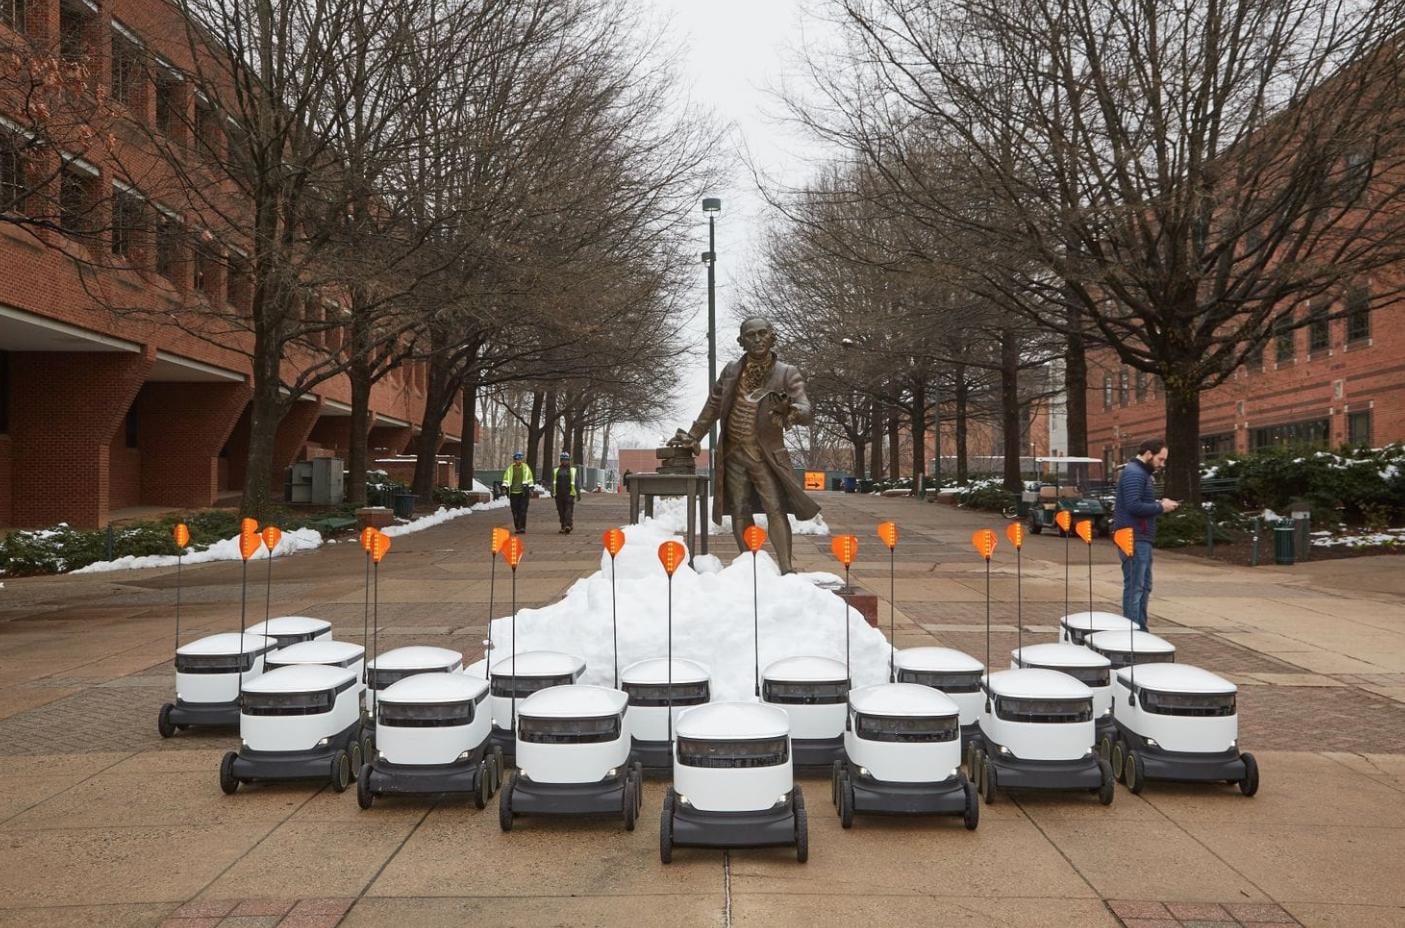 How one university changed overnight when it let 25 semiautonomous robots roam its campus